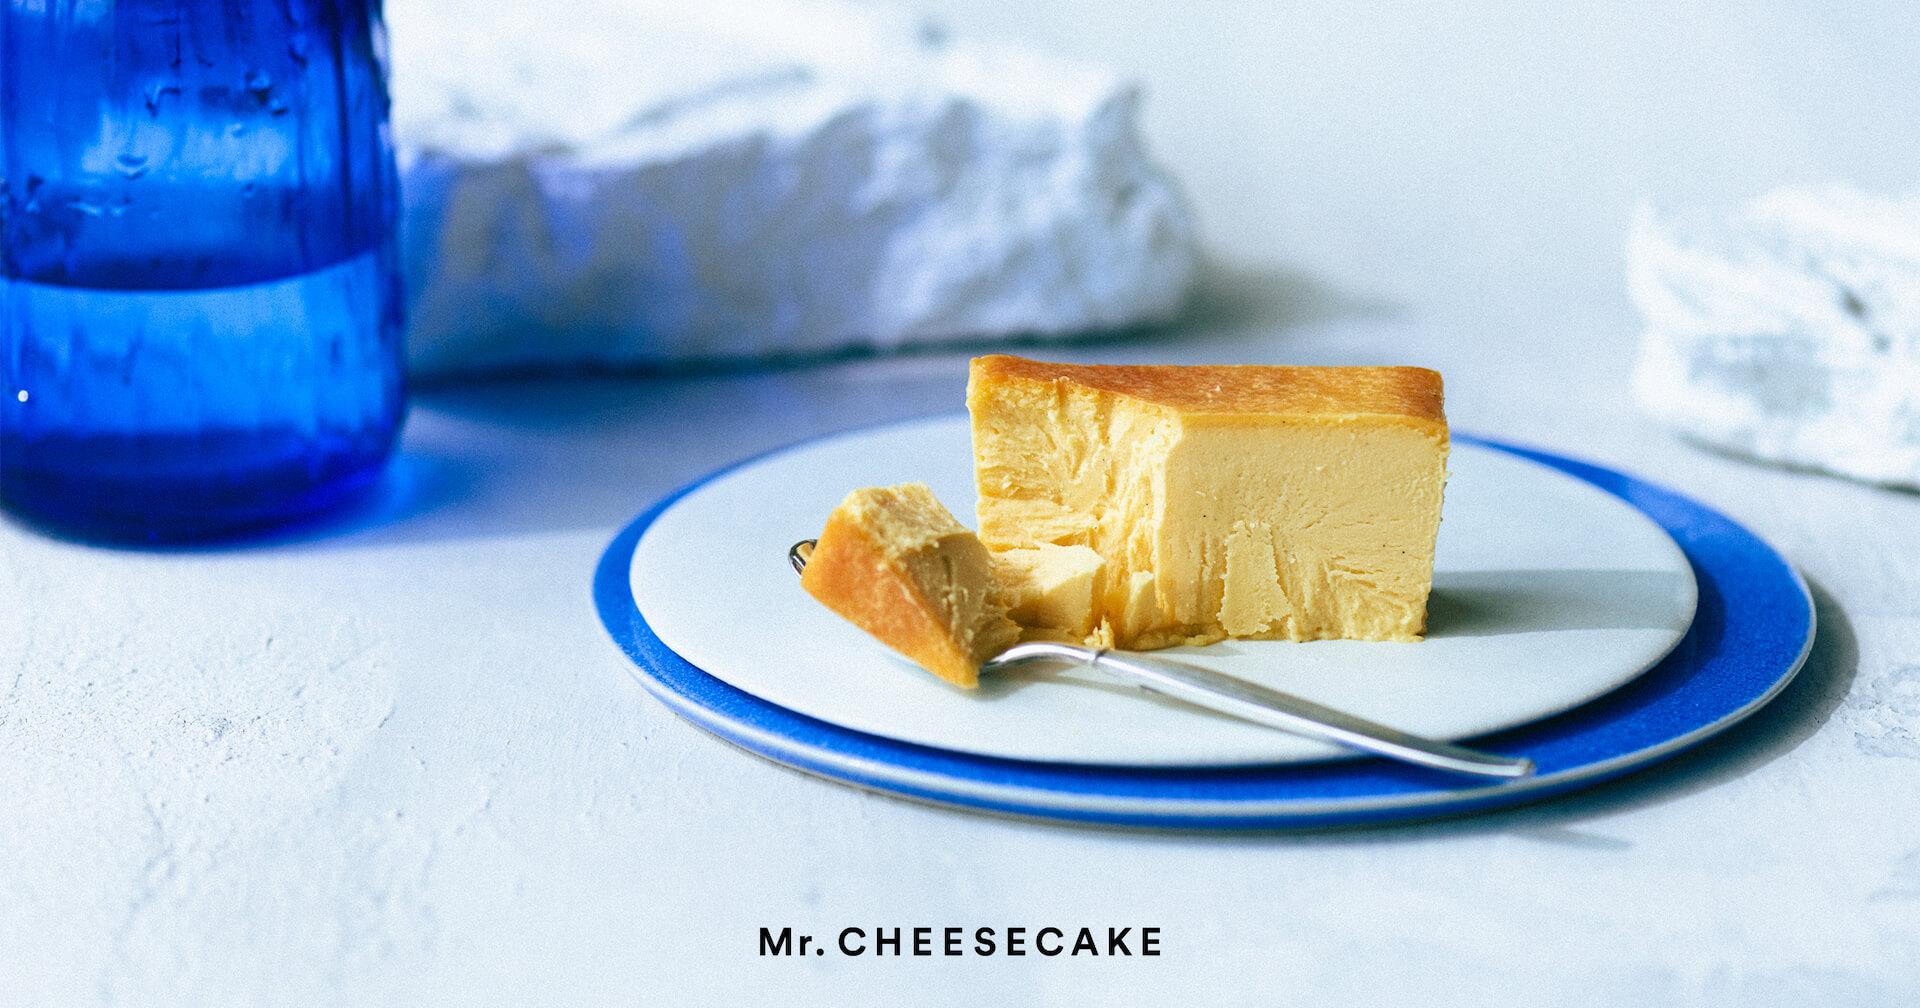 Mr. CHEESECAKEが、真夏の限定フレーバー「Mr. CHEESECAKE UN ETE mango passion」を4日間のみ発売! gourmet_210721_cheesecake2